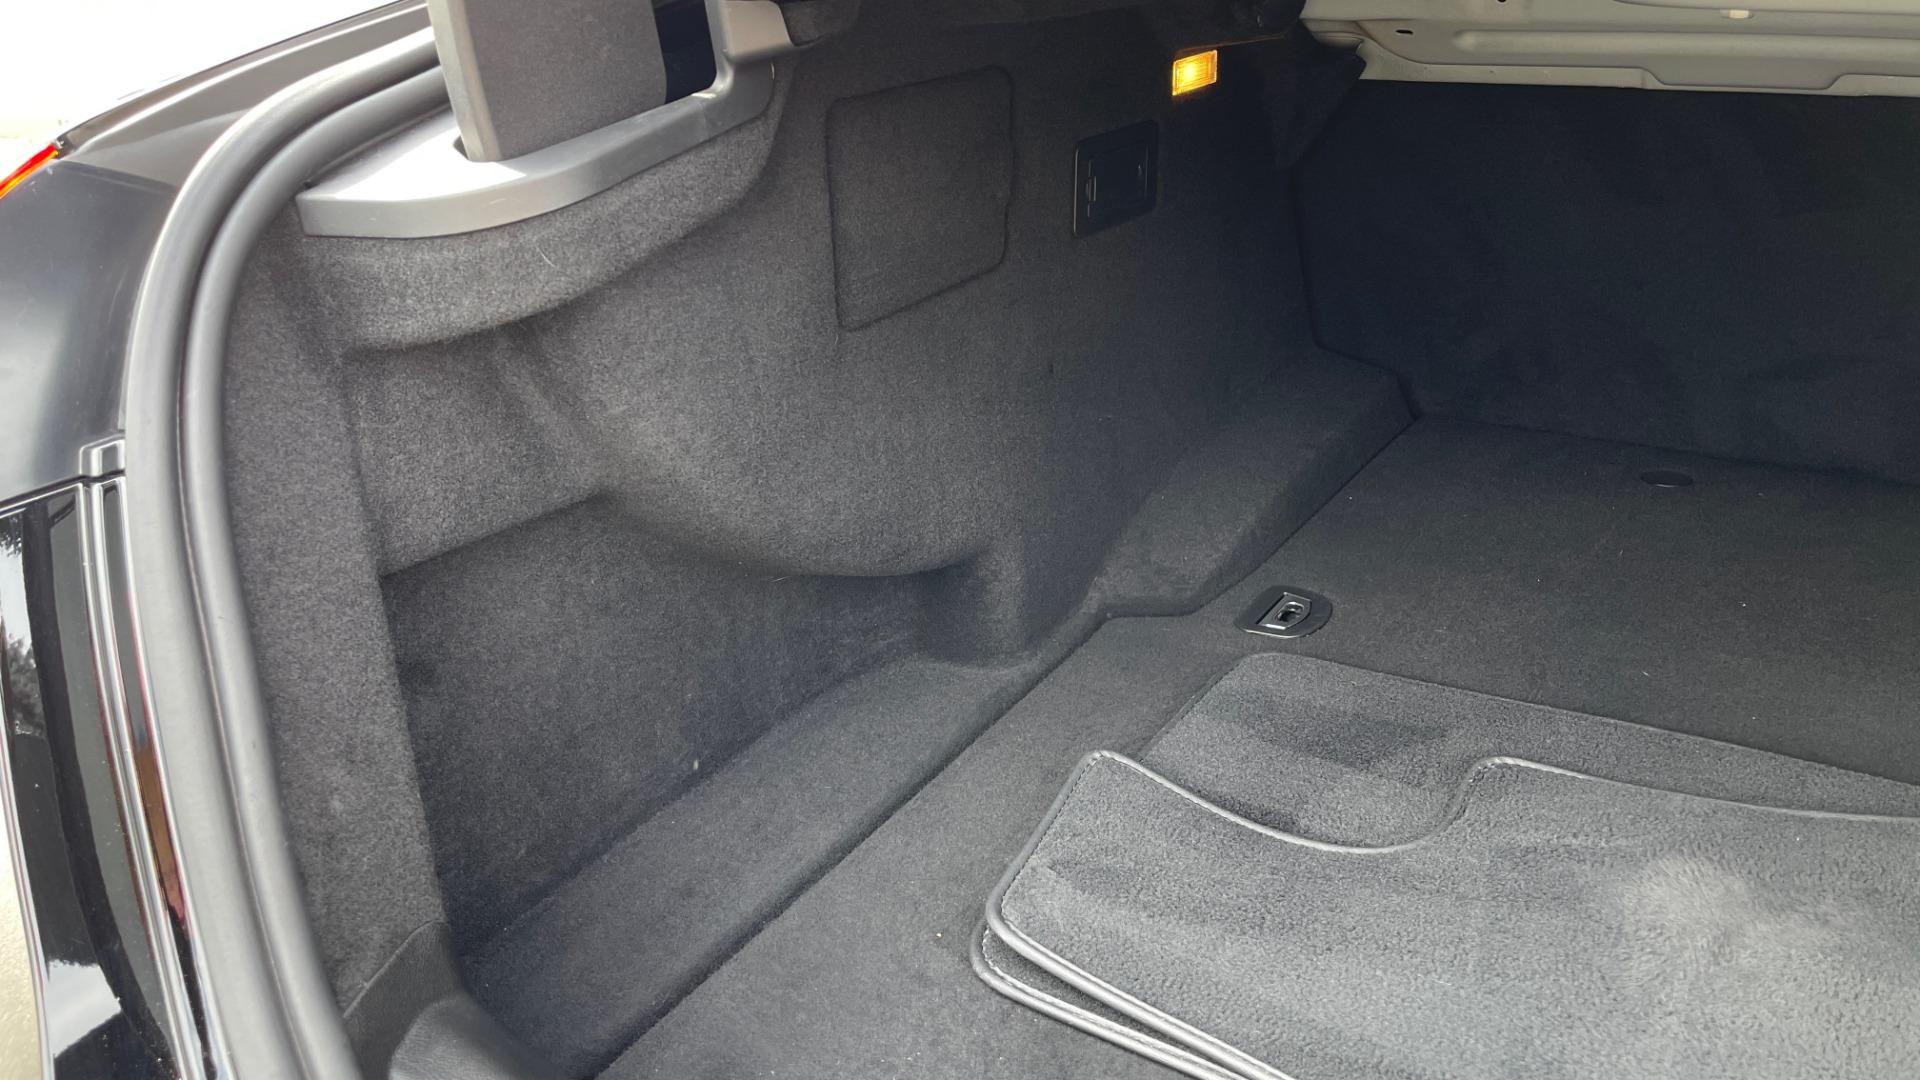 Used 2018 Maserati GHIBLI 3.0L SEDAN / 8-SPD AUTO / NAV / SUNROOF / REARVIEW for sale $42,995 at Formula Imports in Charlotte NC 28227 21